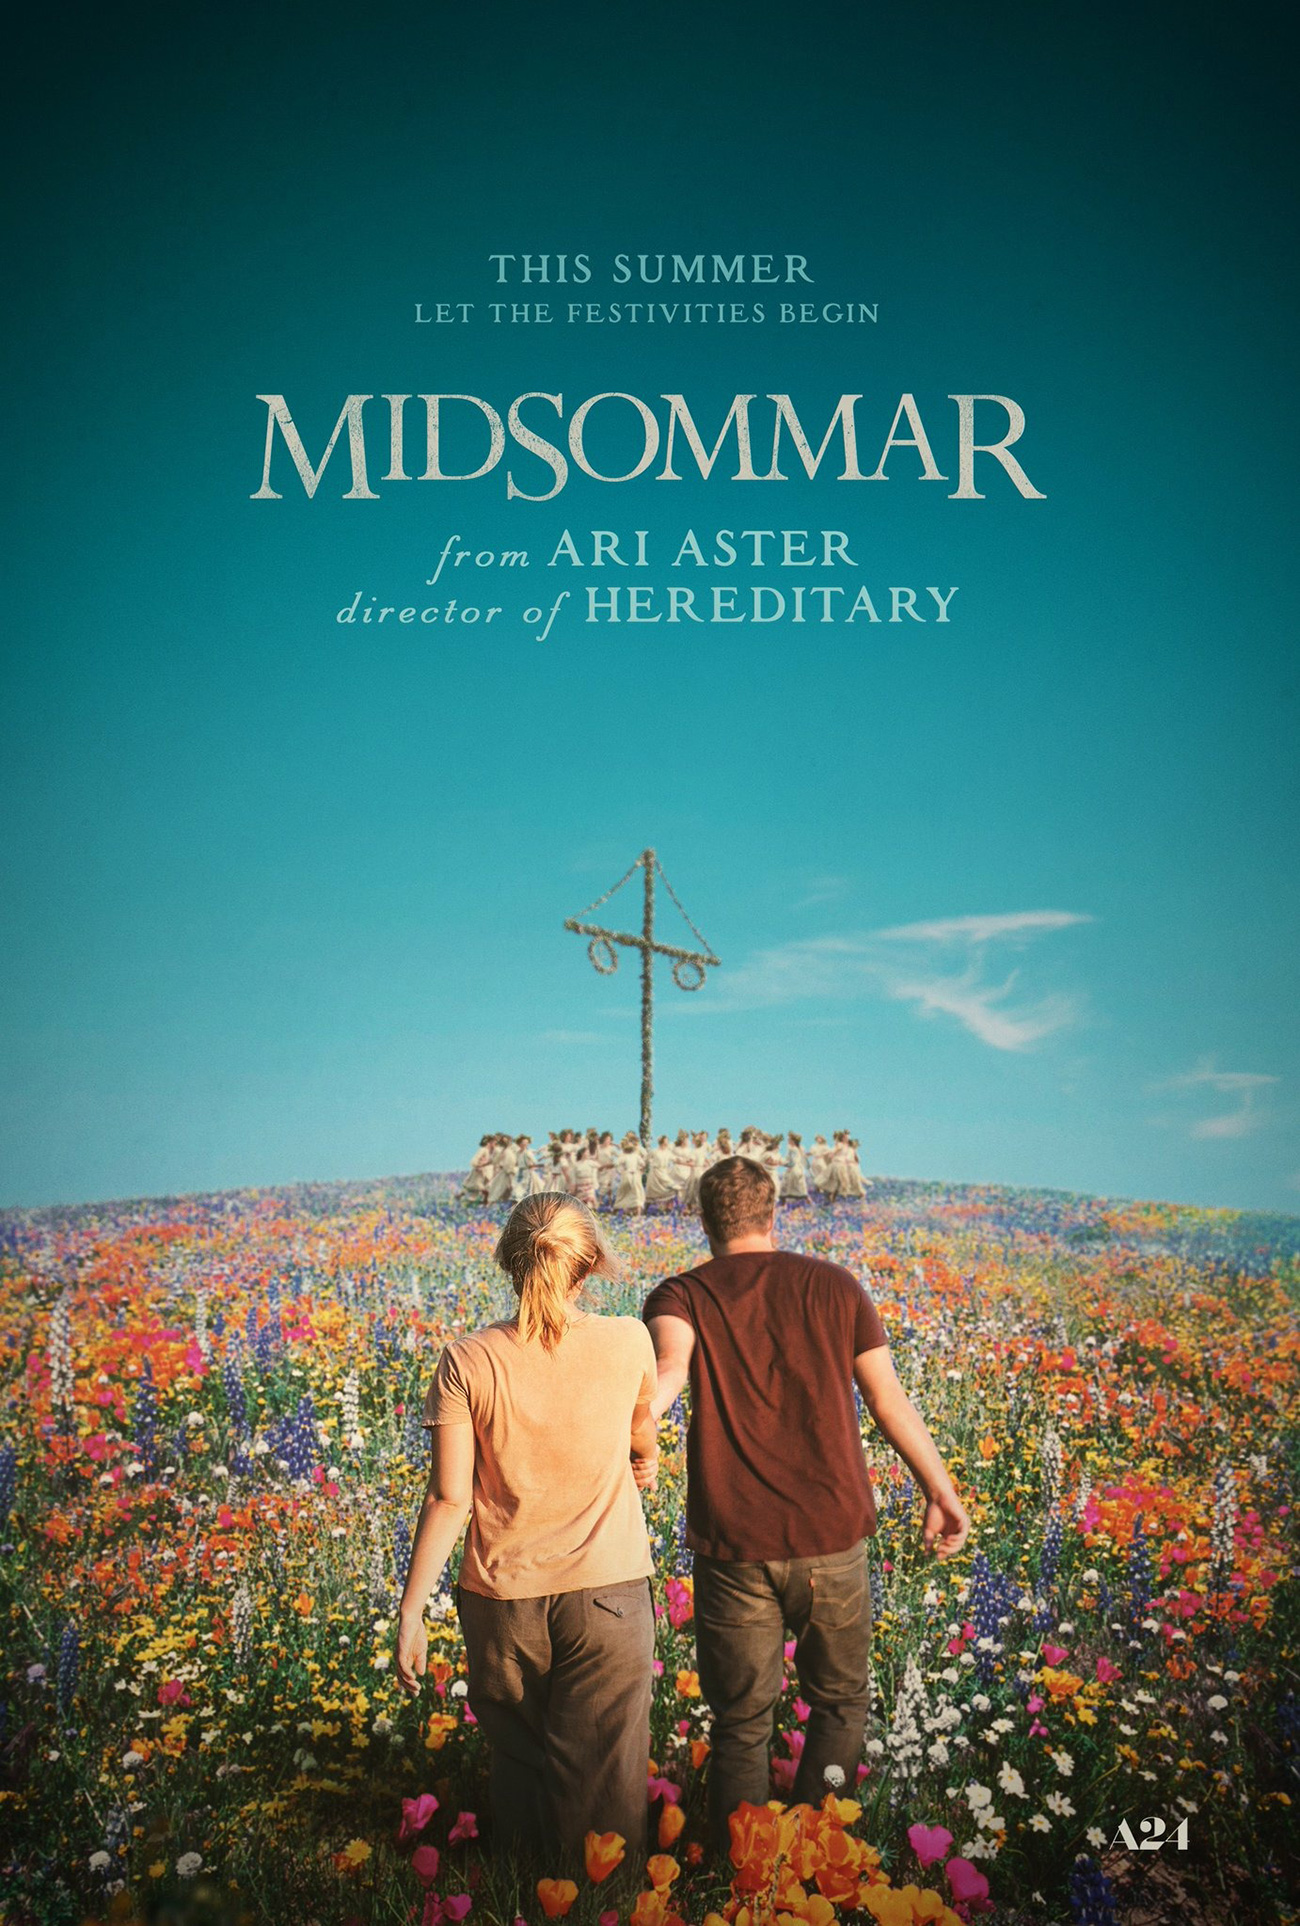 midsommar-trailer-poster.jpg